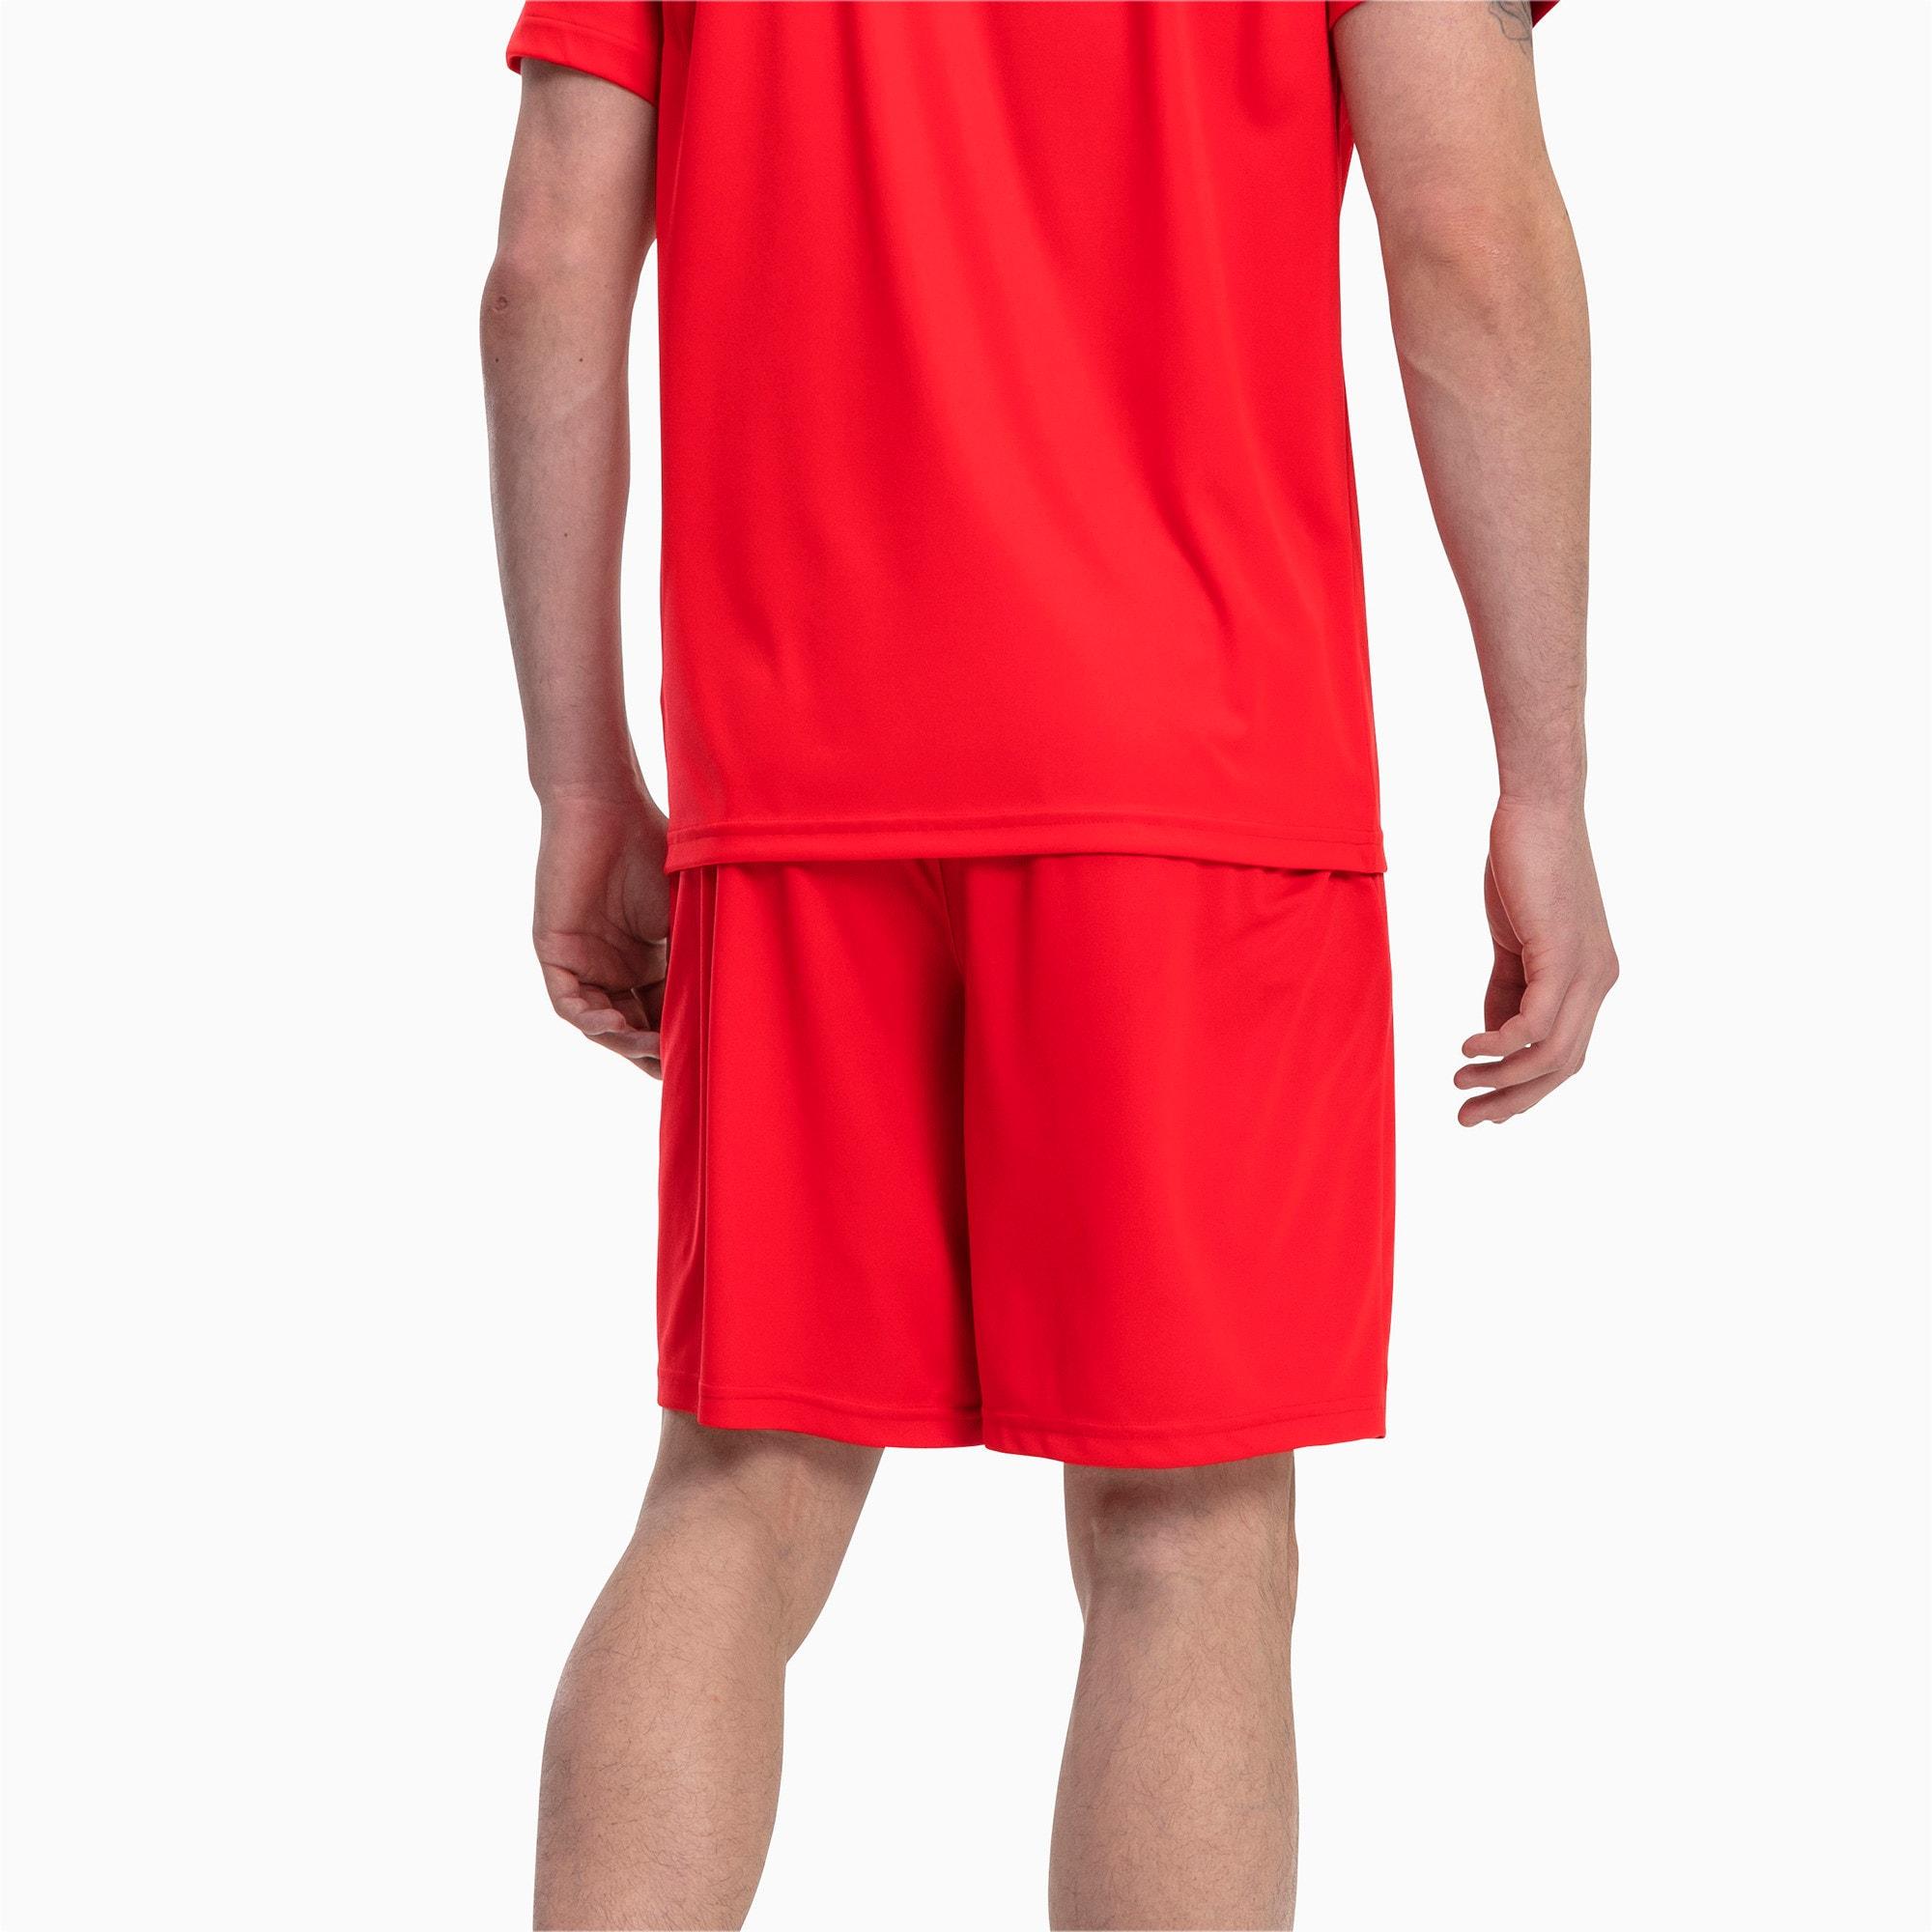 Thumbnail 2 of Liga Core Men's Shorts, Puma Red-Puma White, medium